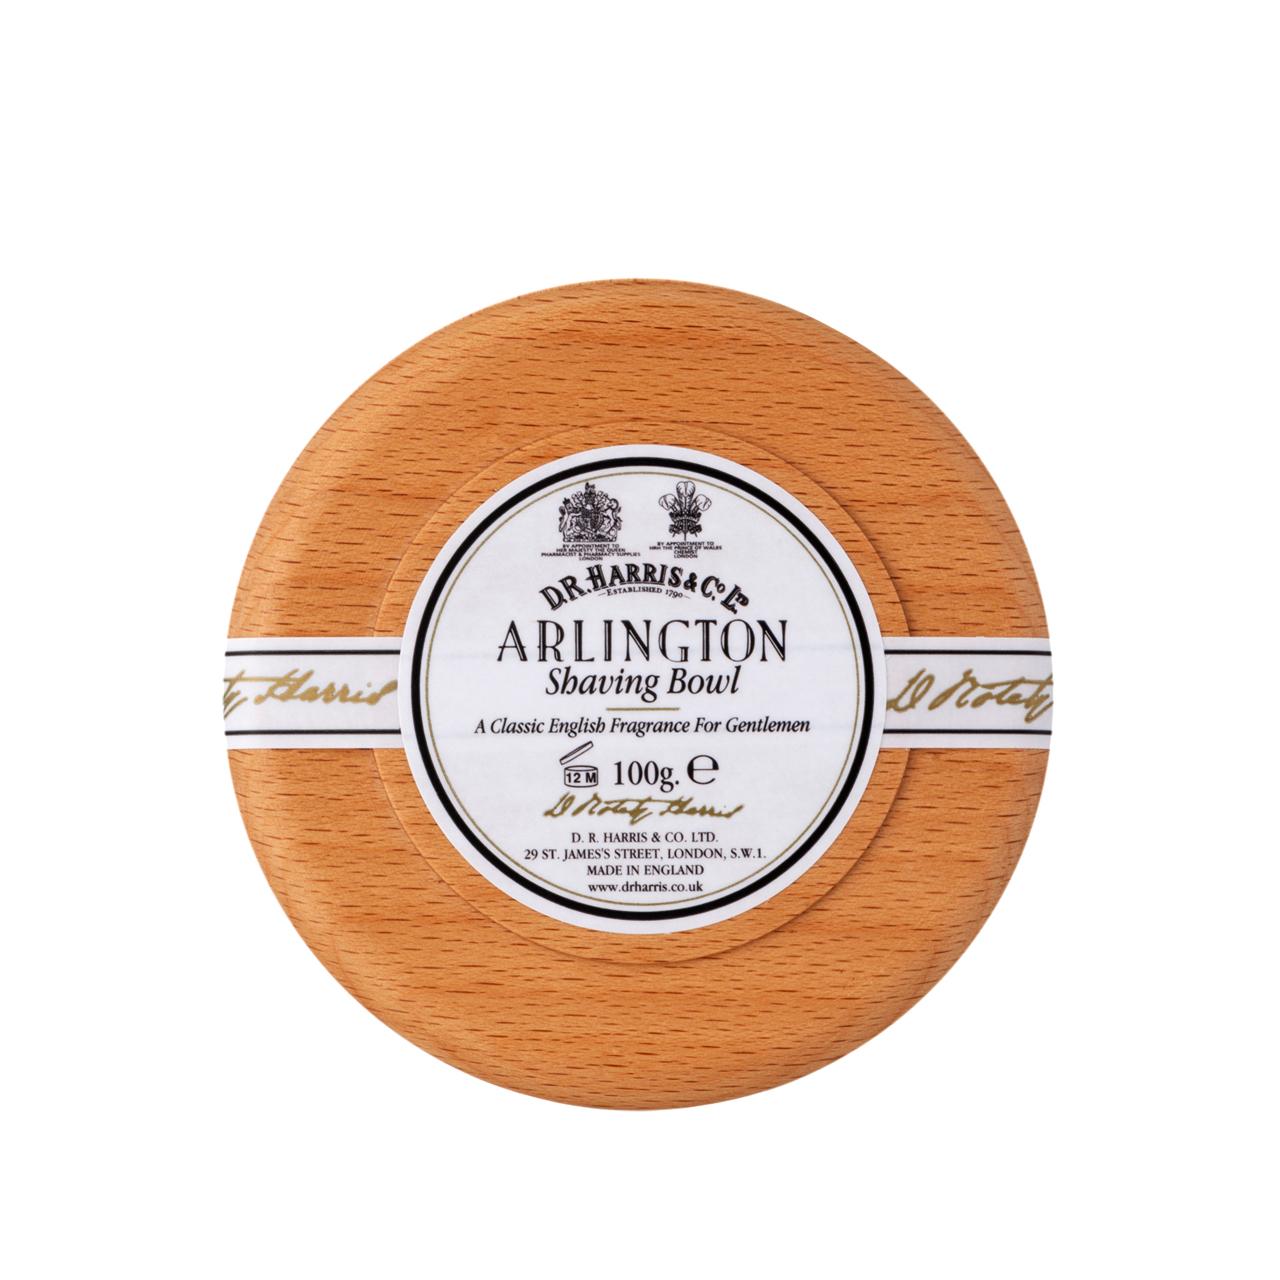 Arlington - Shaving Soap Bowl